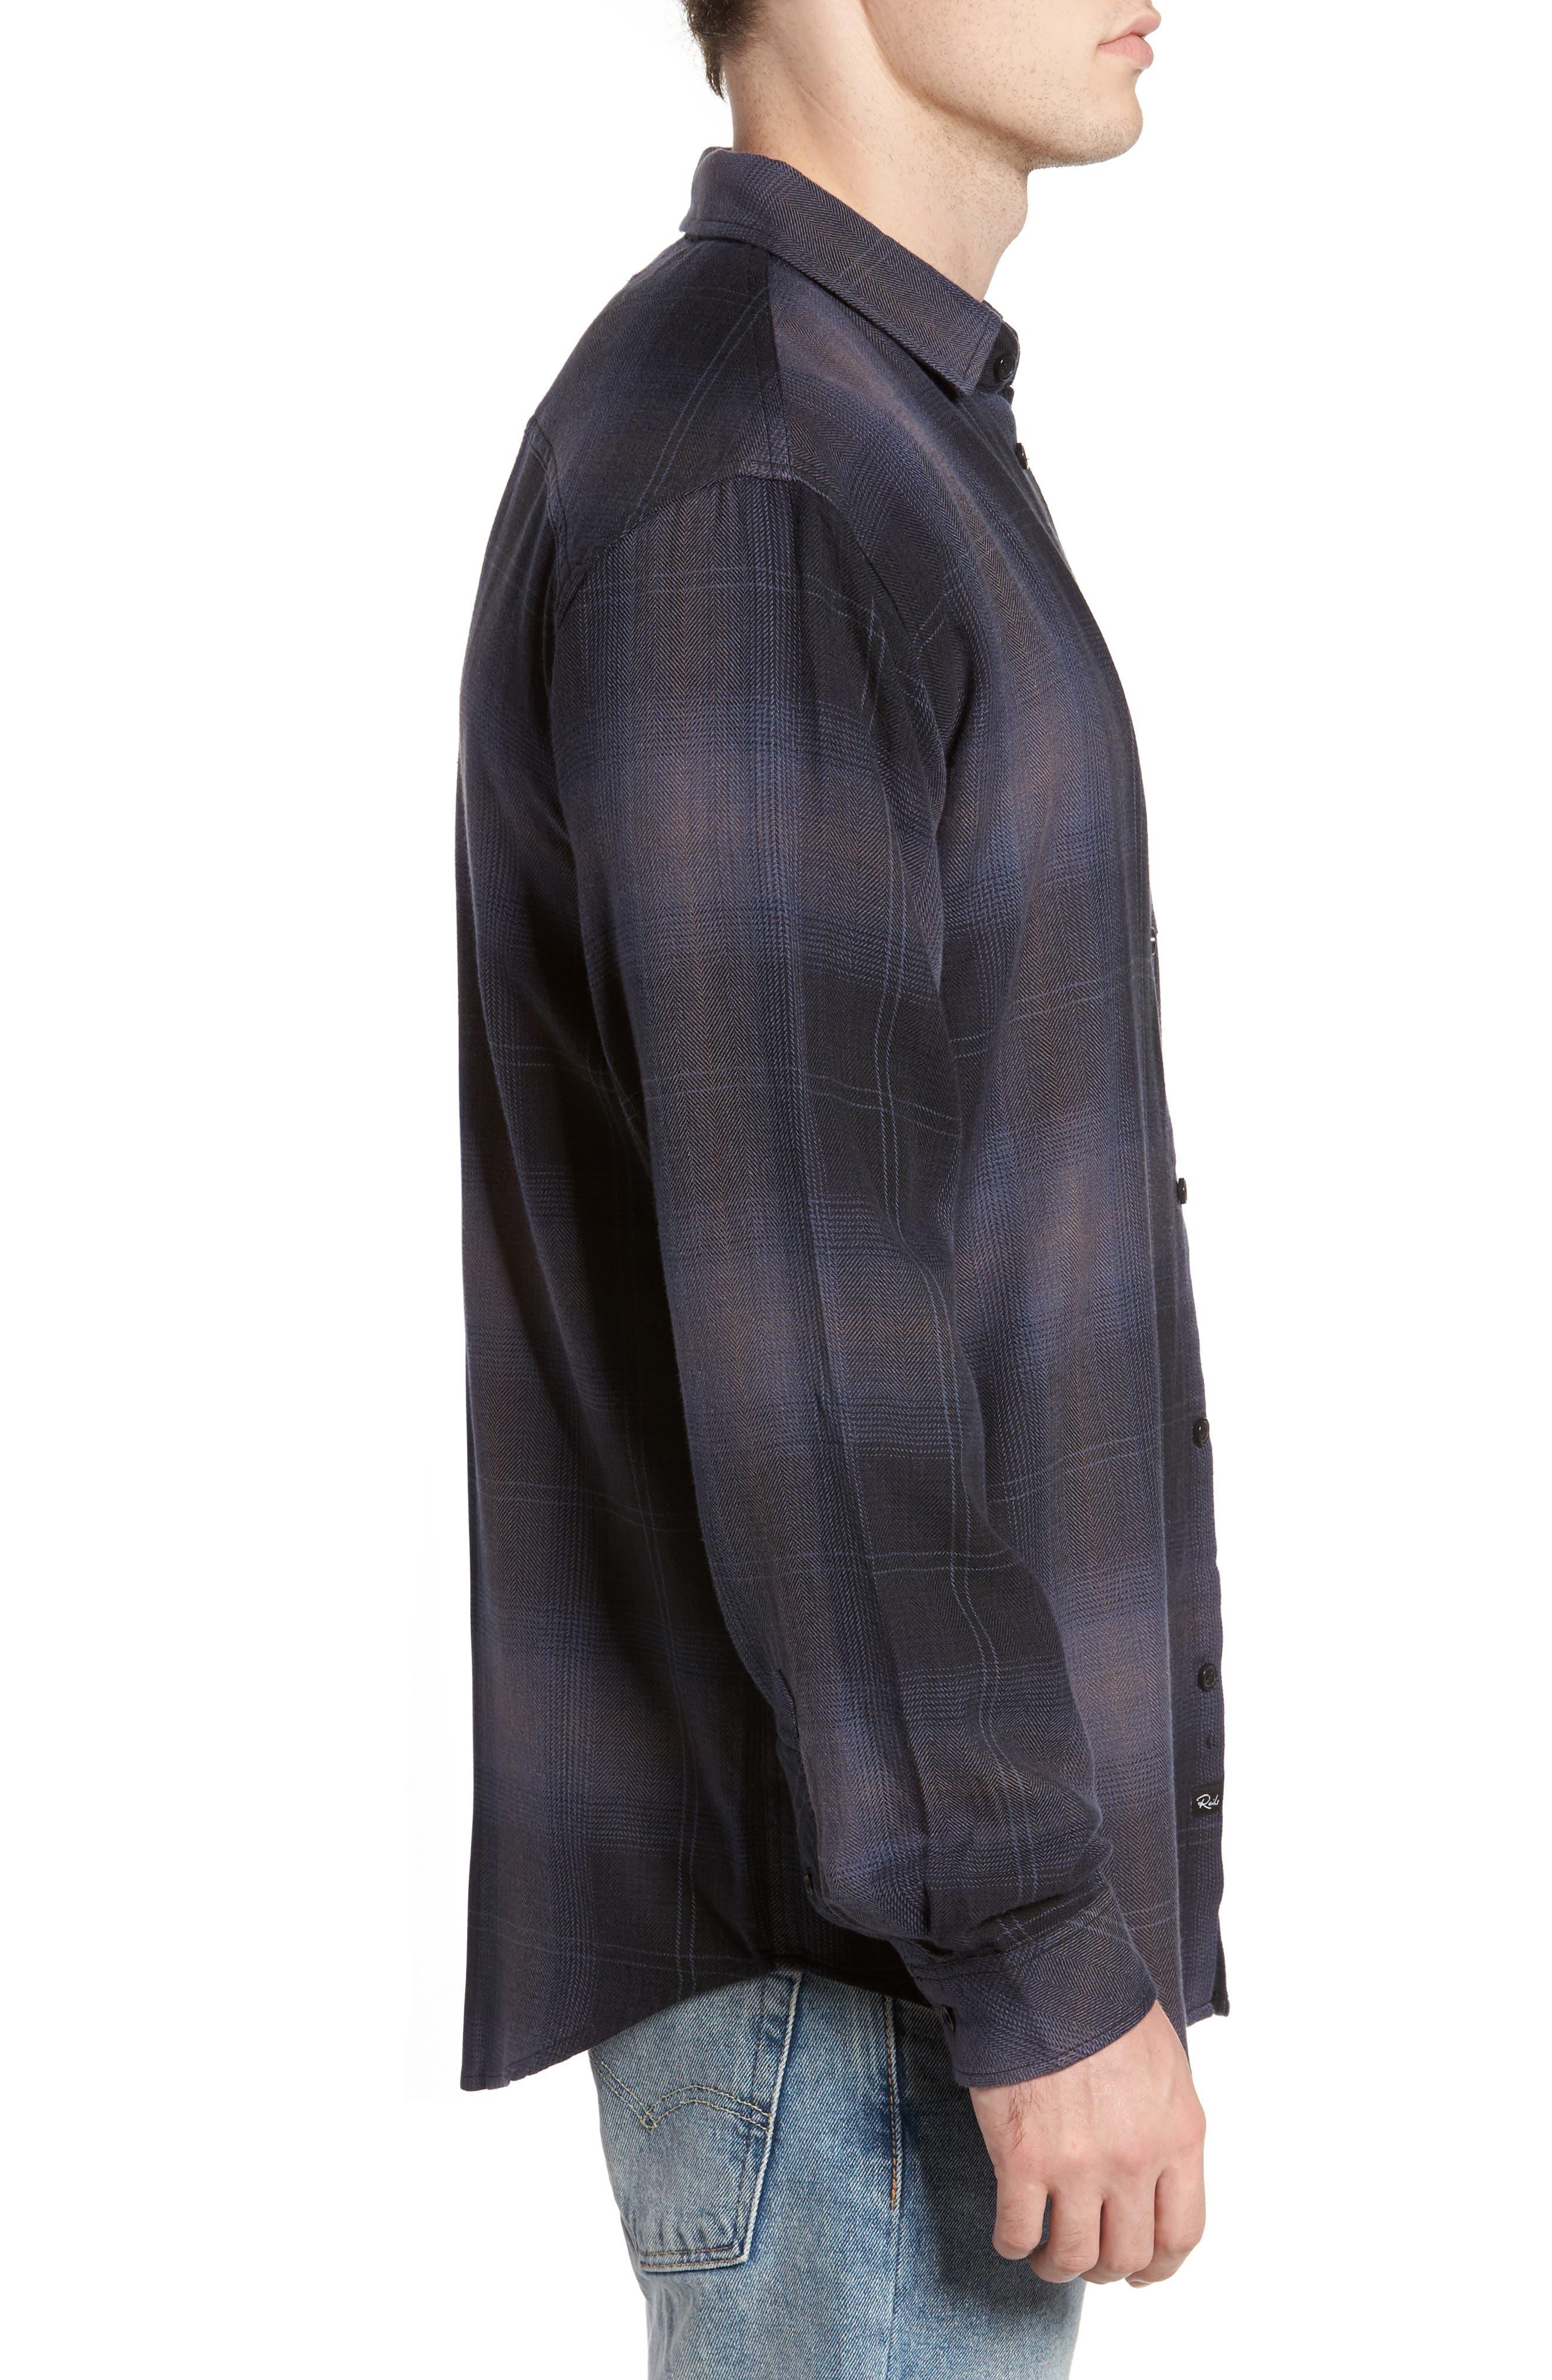 Lennox Sport Shirt,                             Alternate thumbnail 3, color,                             CHARCOAL/ BLACK